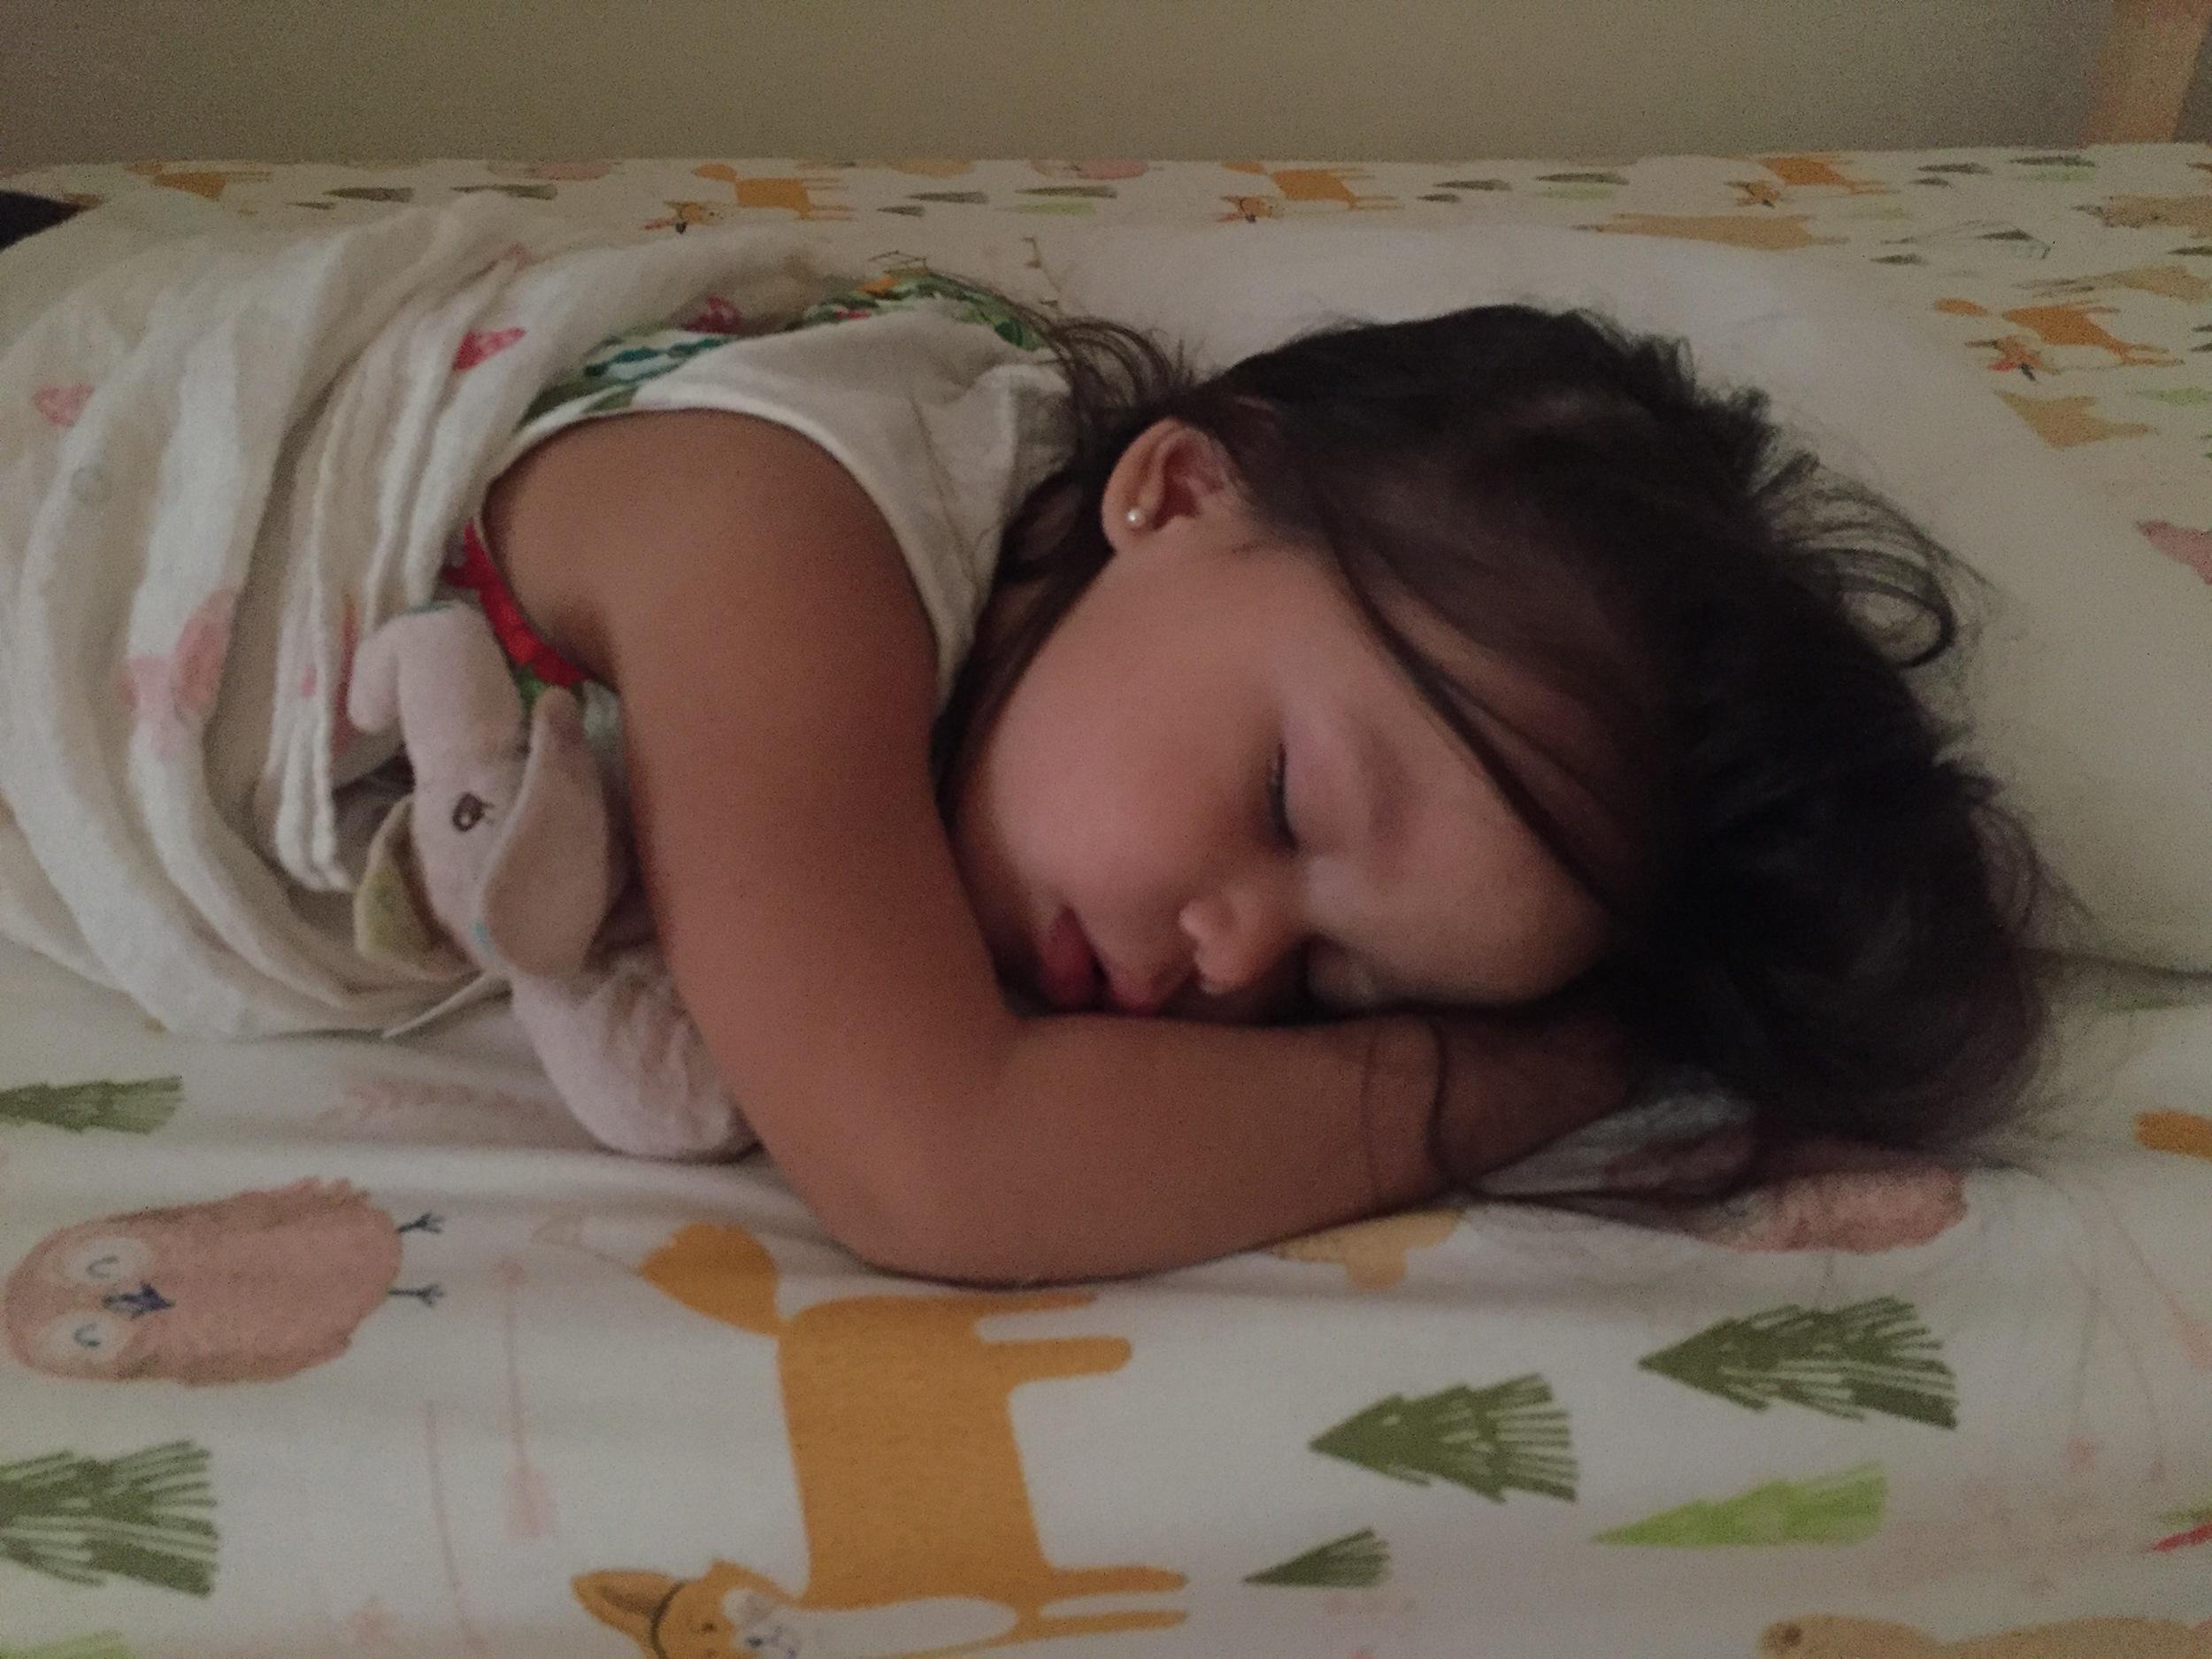 So sweet when she sleeps!